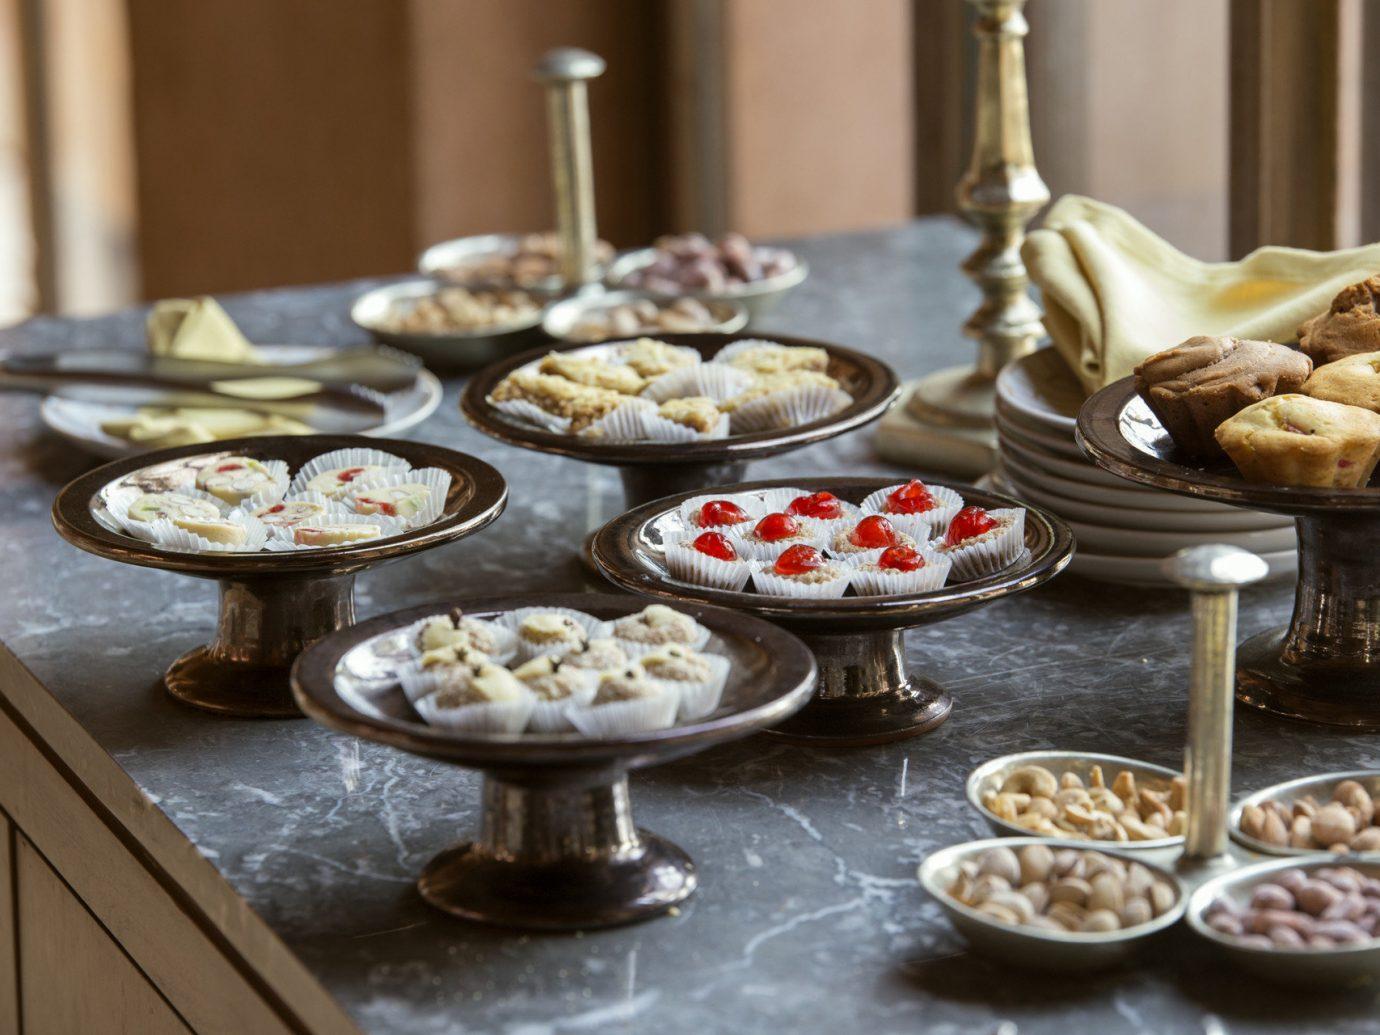 Hotels indoor plate food meal dish counter dessert breakfast buffet baking brunch produce several